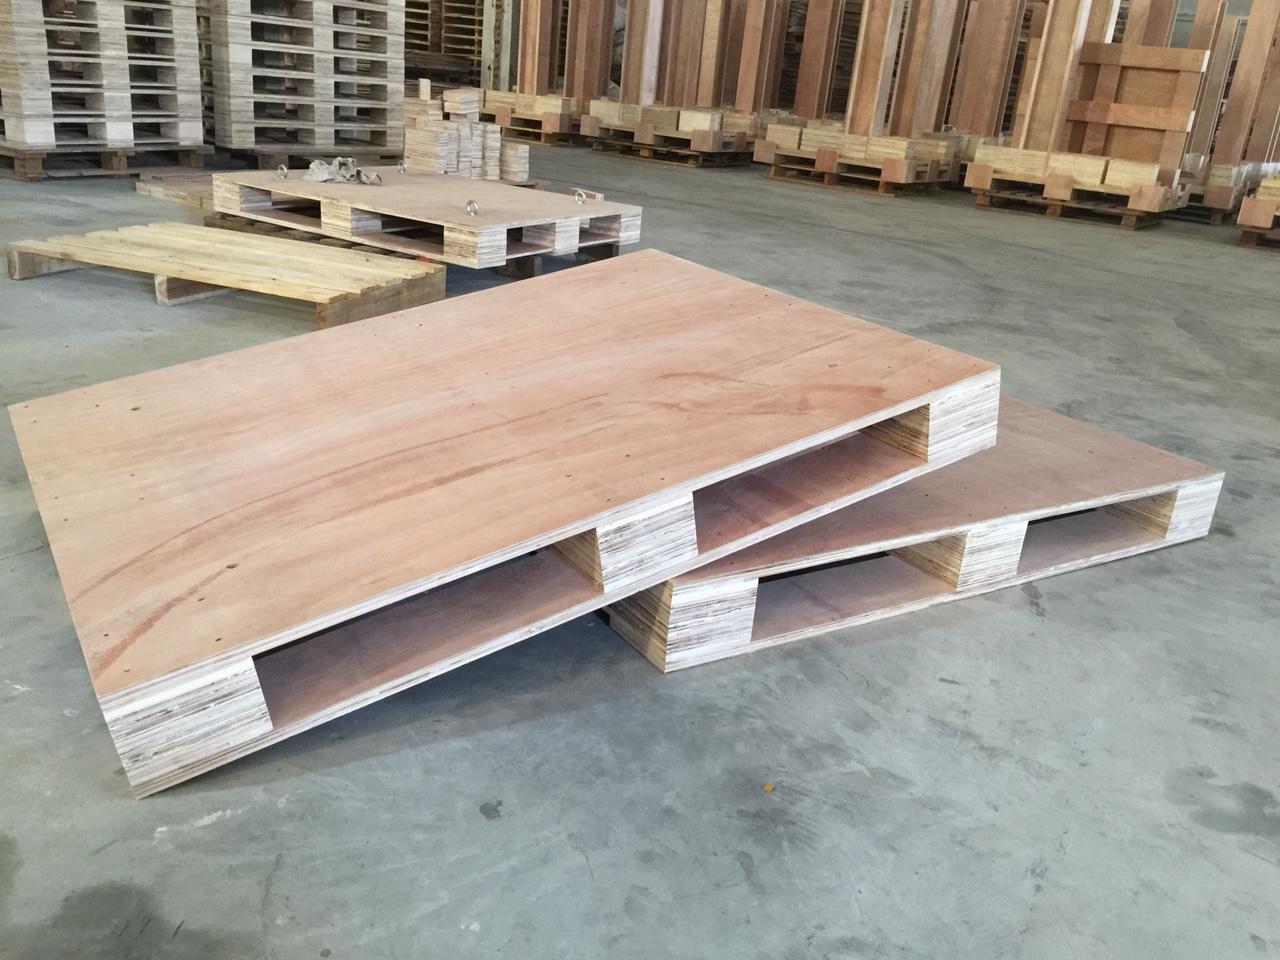 keo dán gỗ